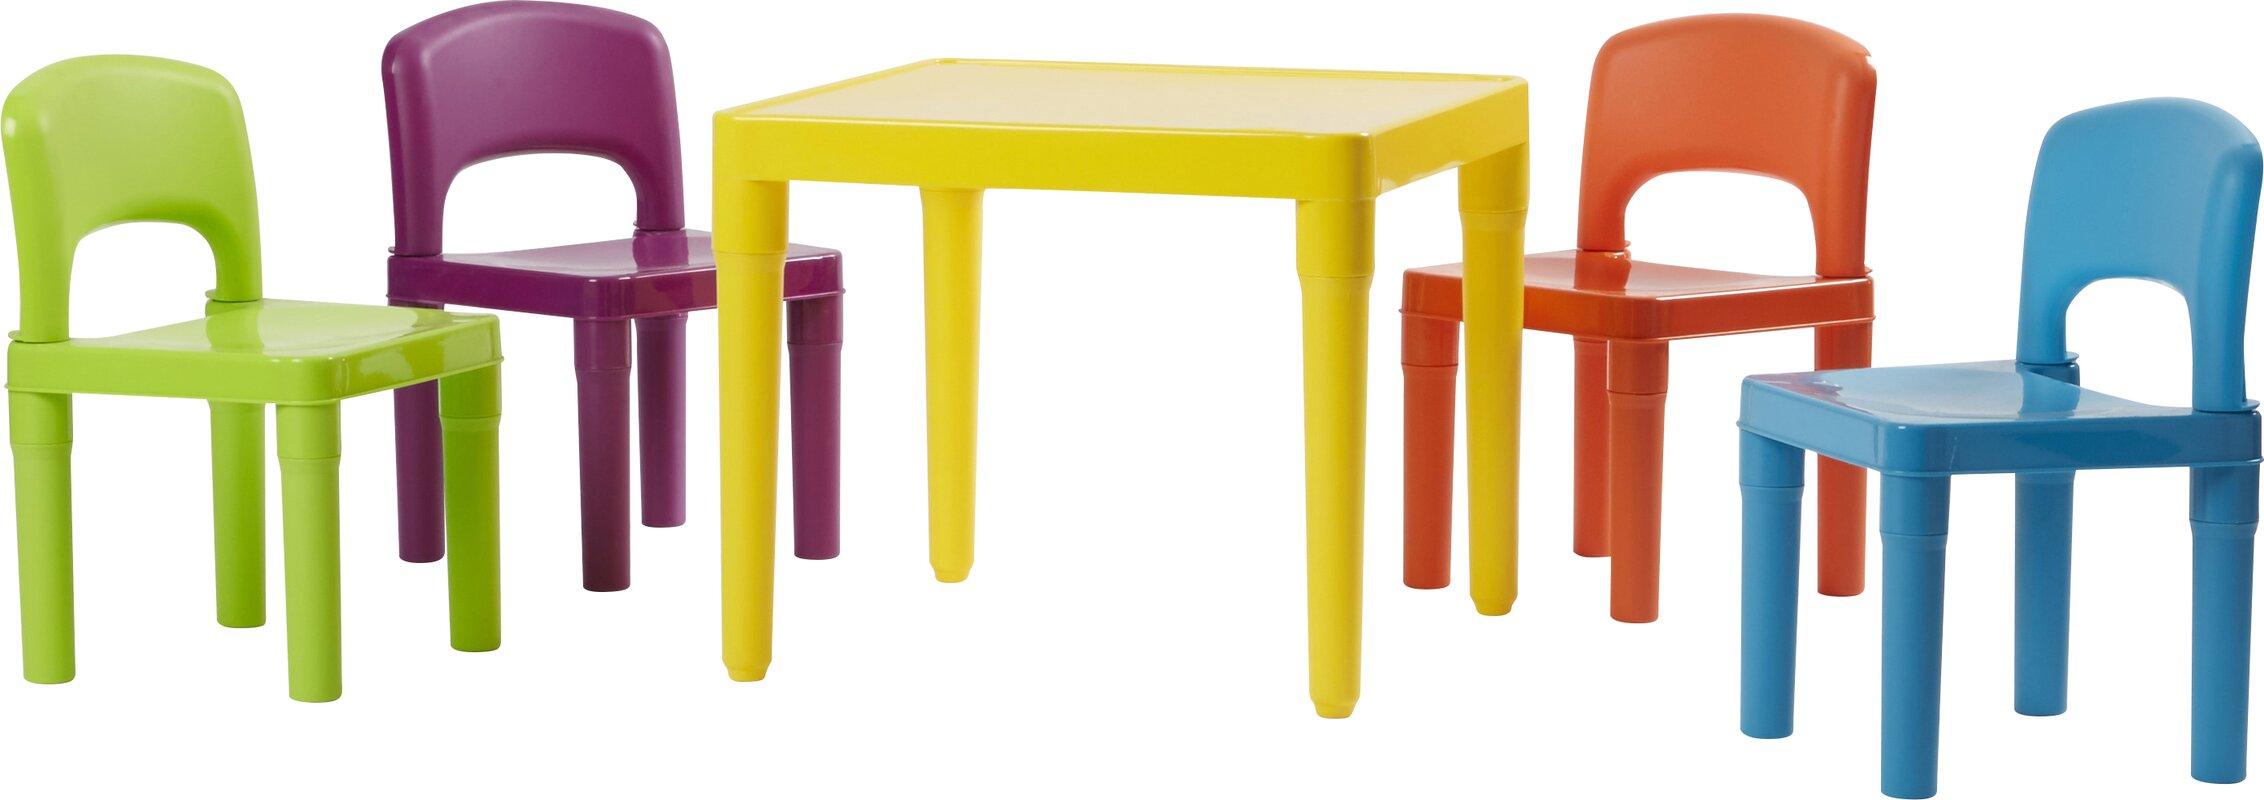 Jabari Kids 5 Piece Plastic Table and Chair Set  sc 1 st  Wayfair & Viv + Rae Jabari Kids 5 Piece Plastic Table and Chair Set ...